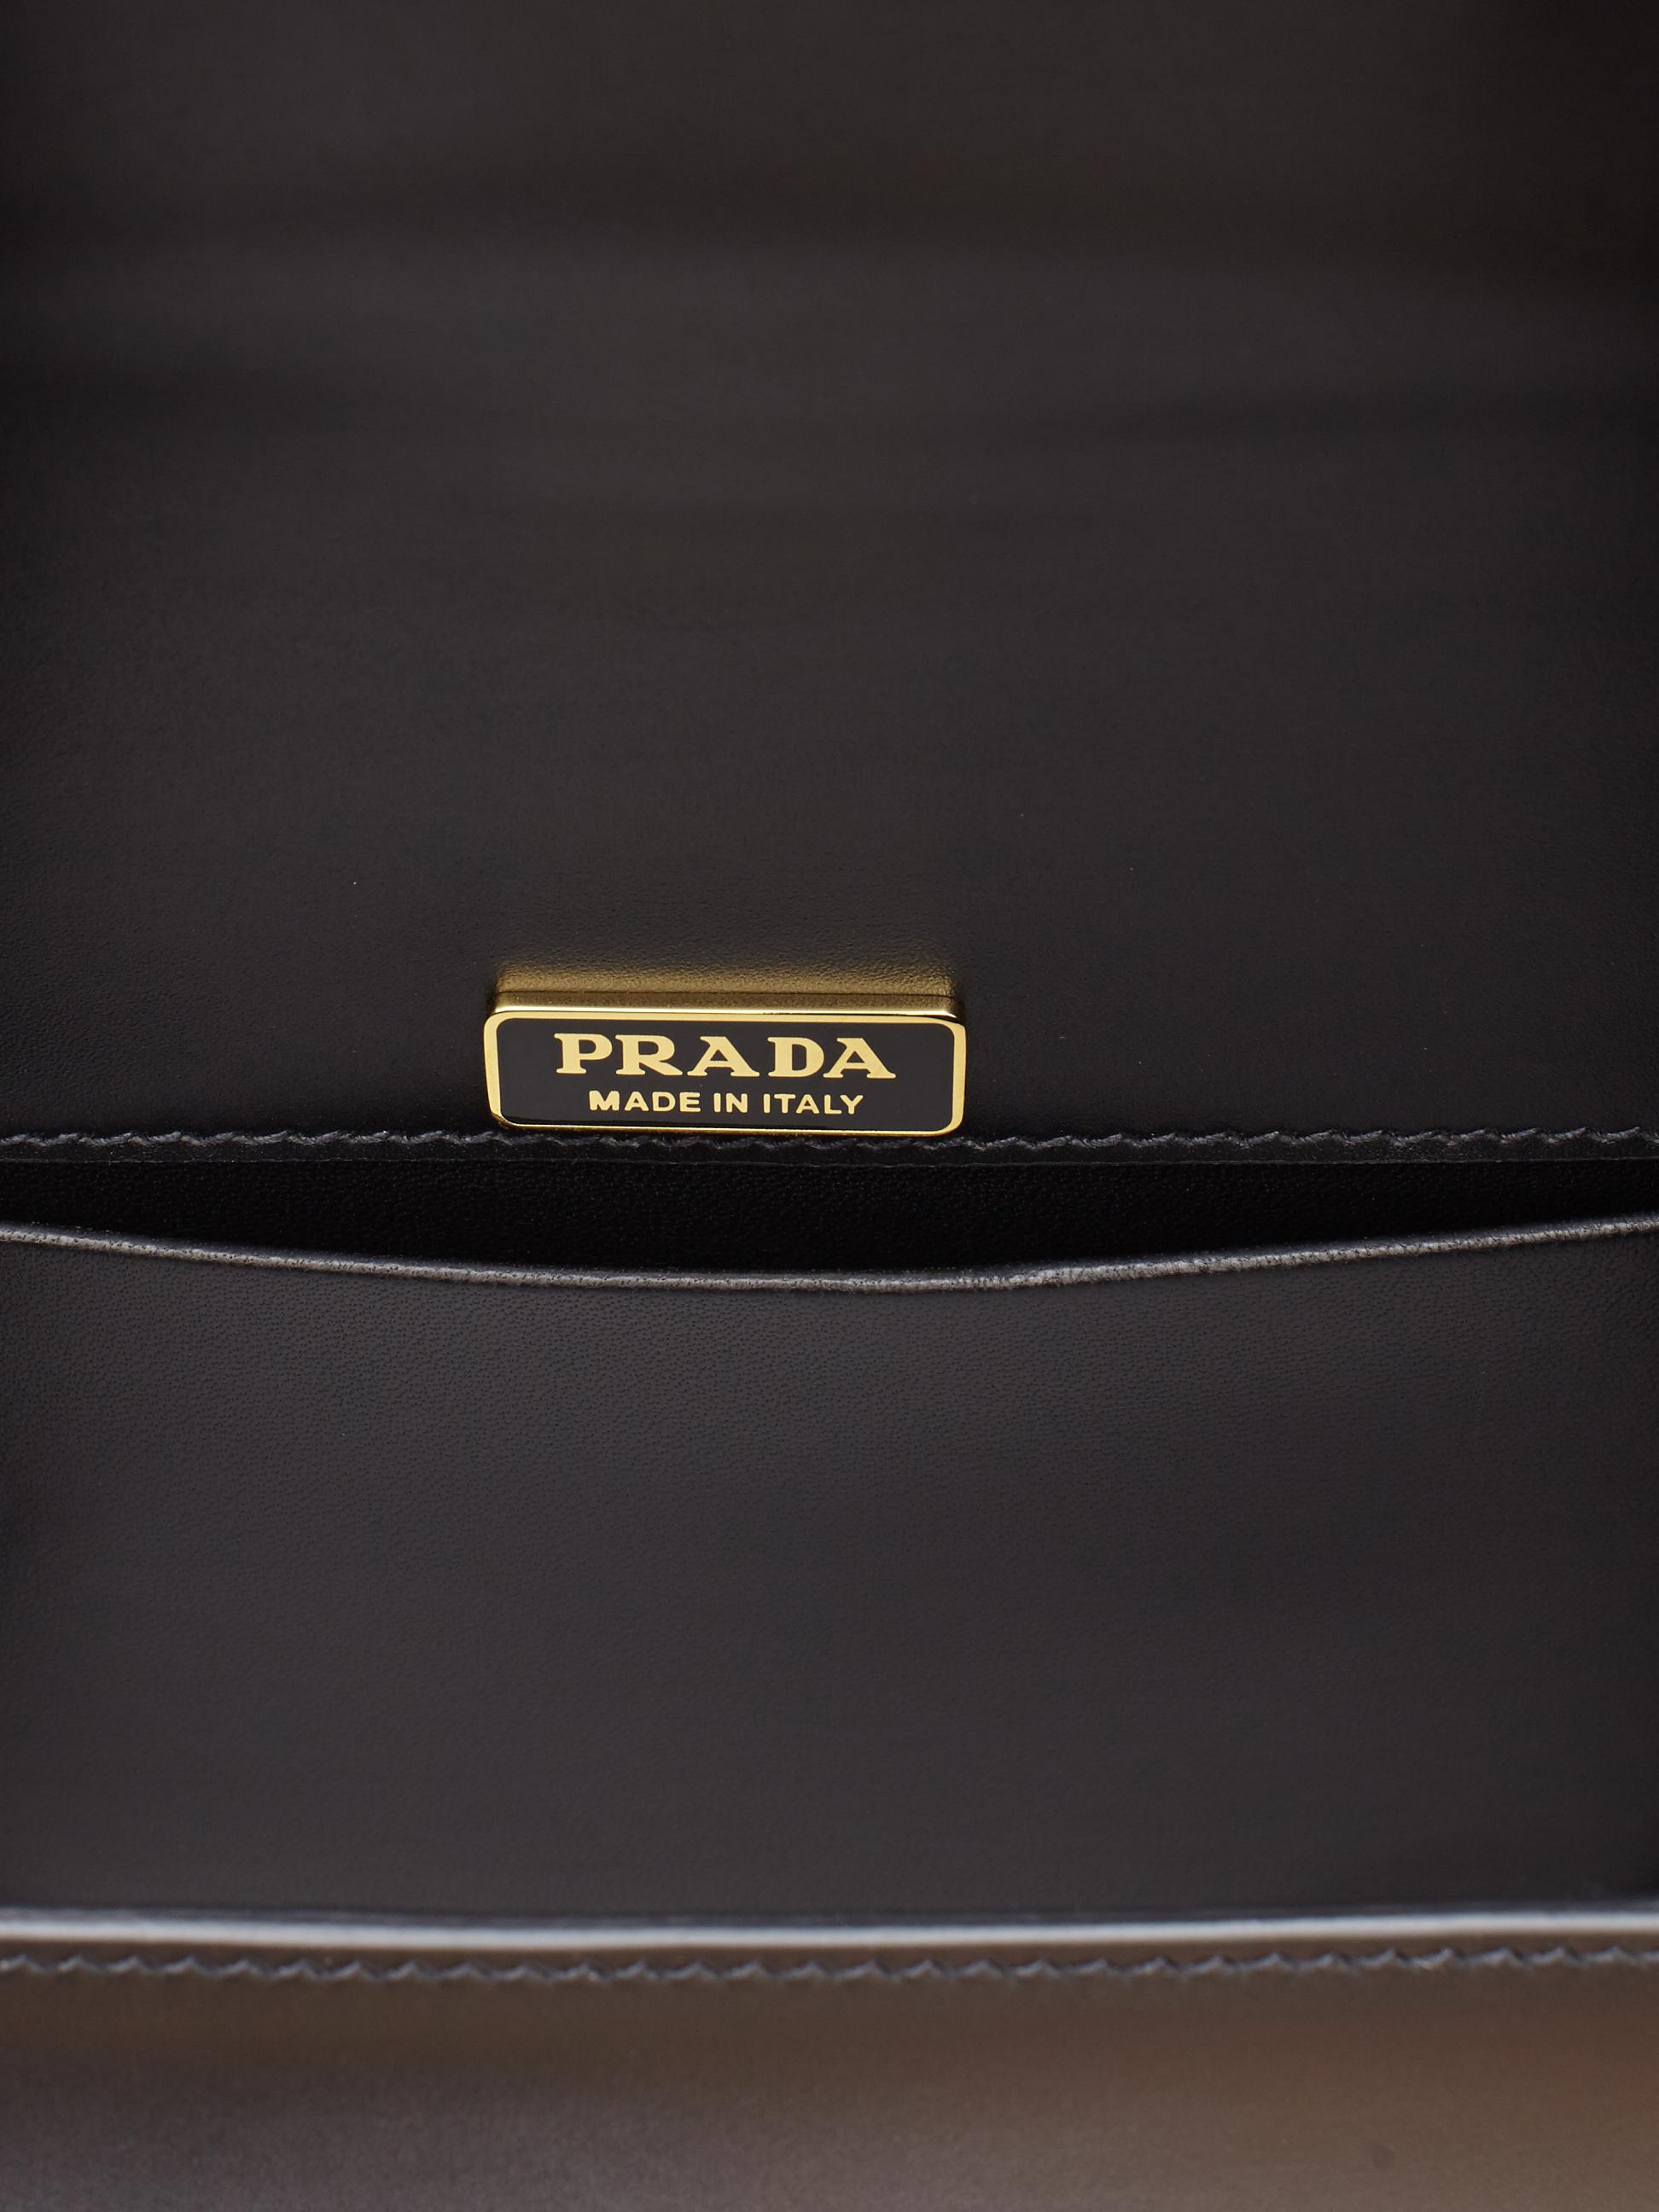 637f40d96669 ... norway lyst prada cahier lion head leather bag in black f8b64 9e353